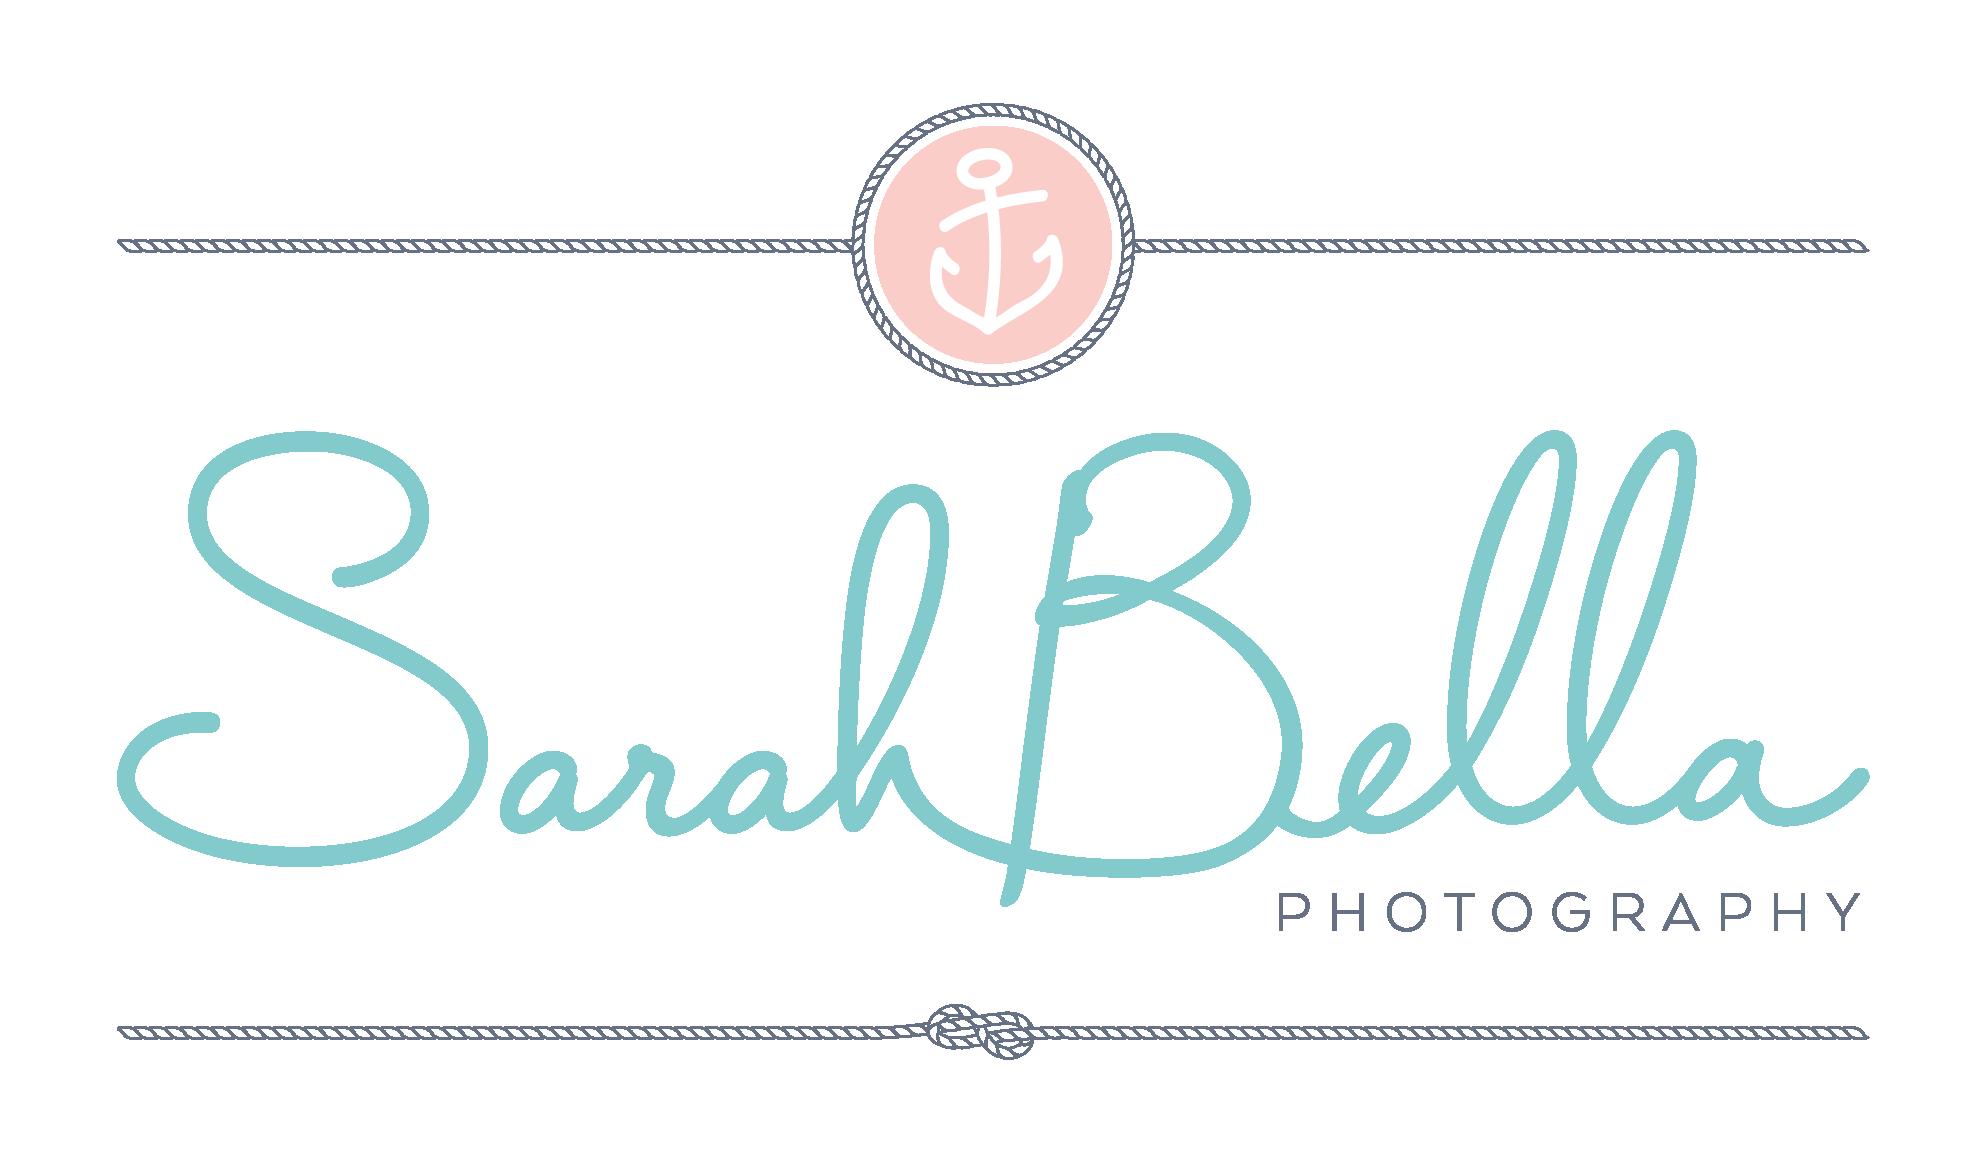 Final Logo design for Sarah Bella Photography.